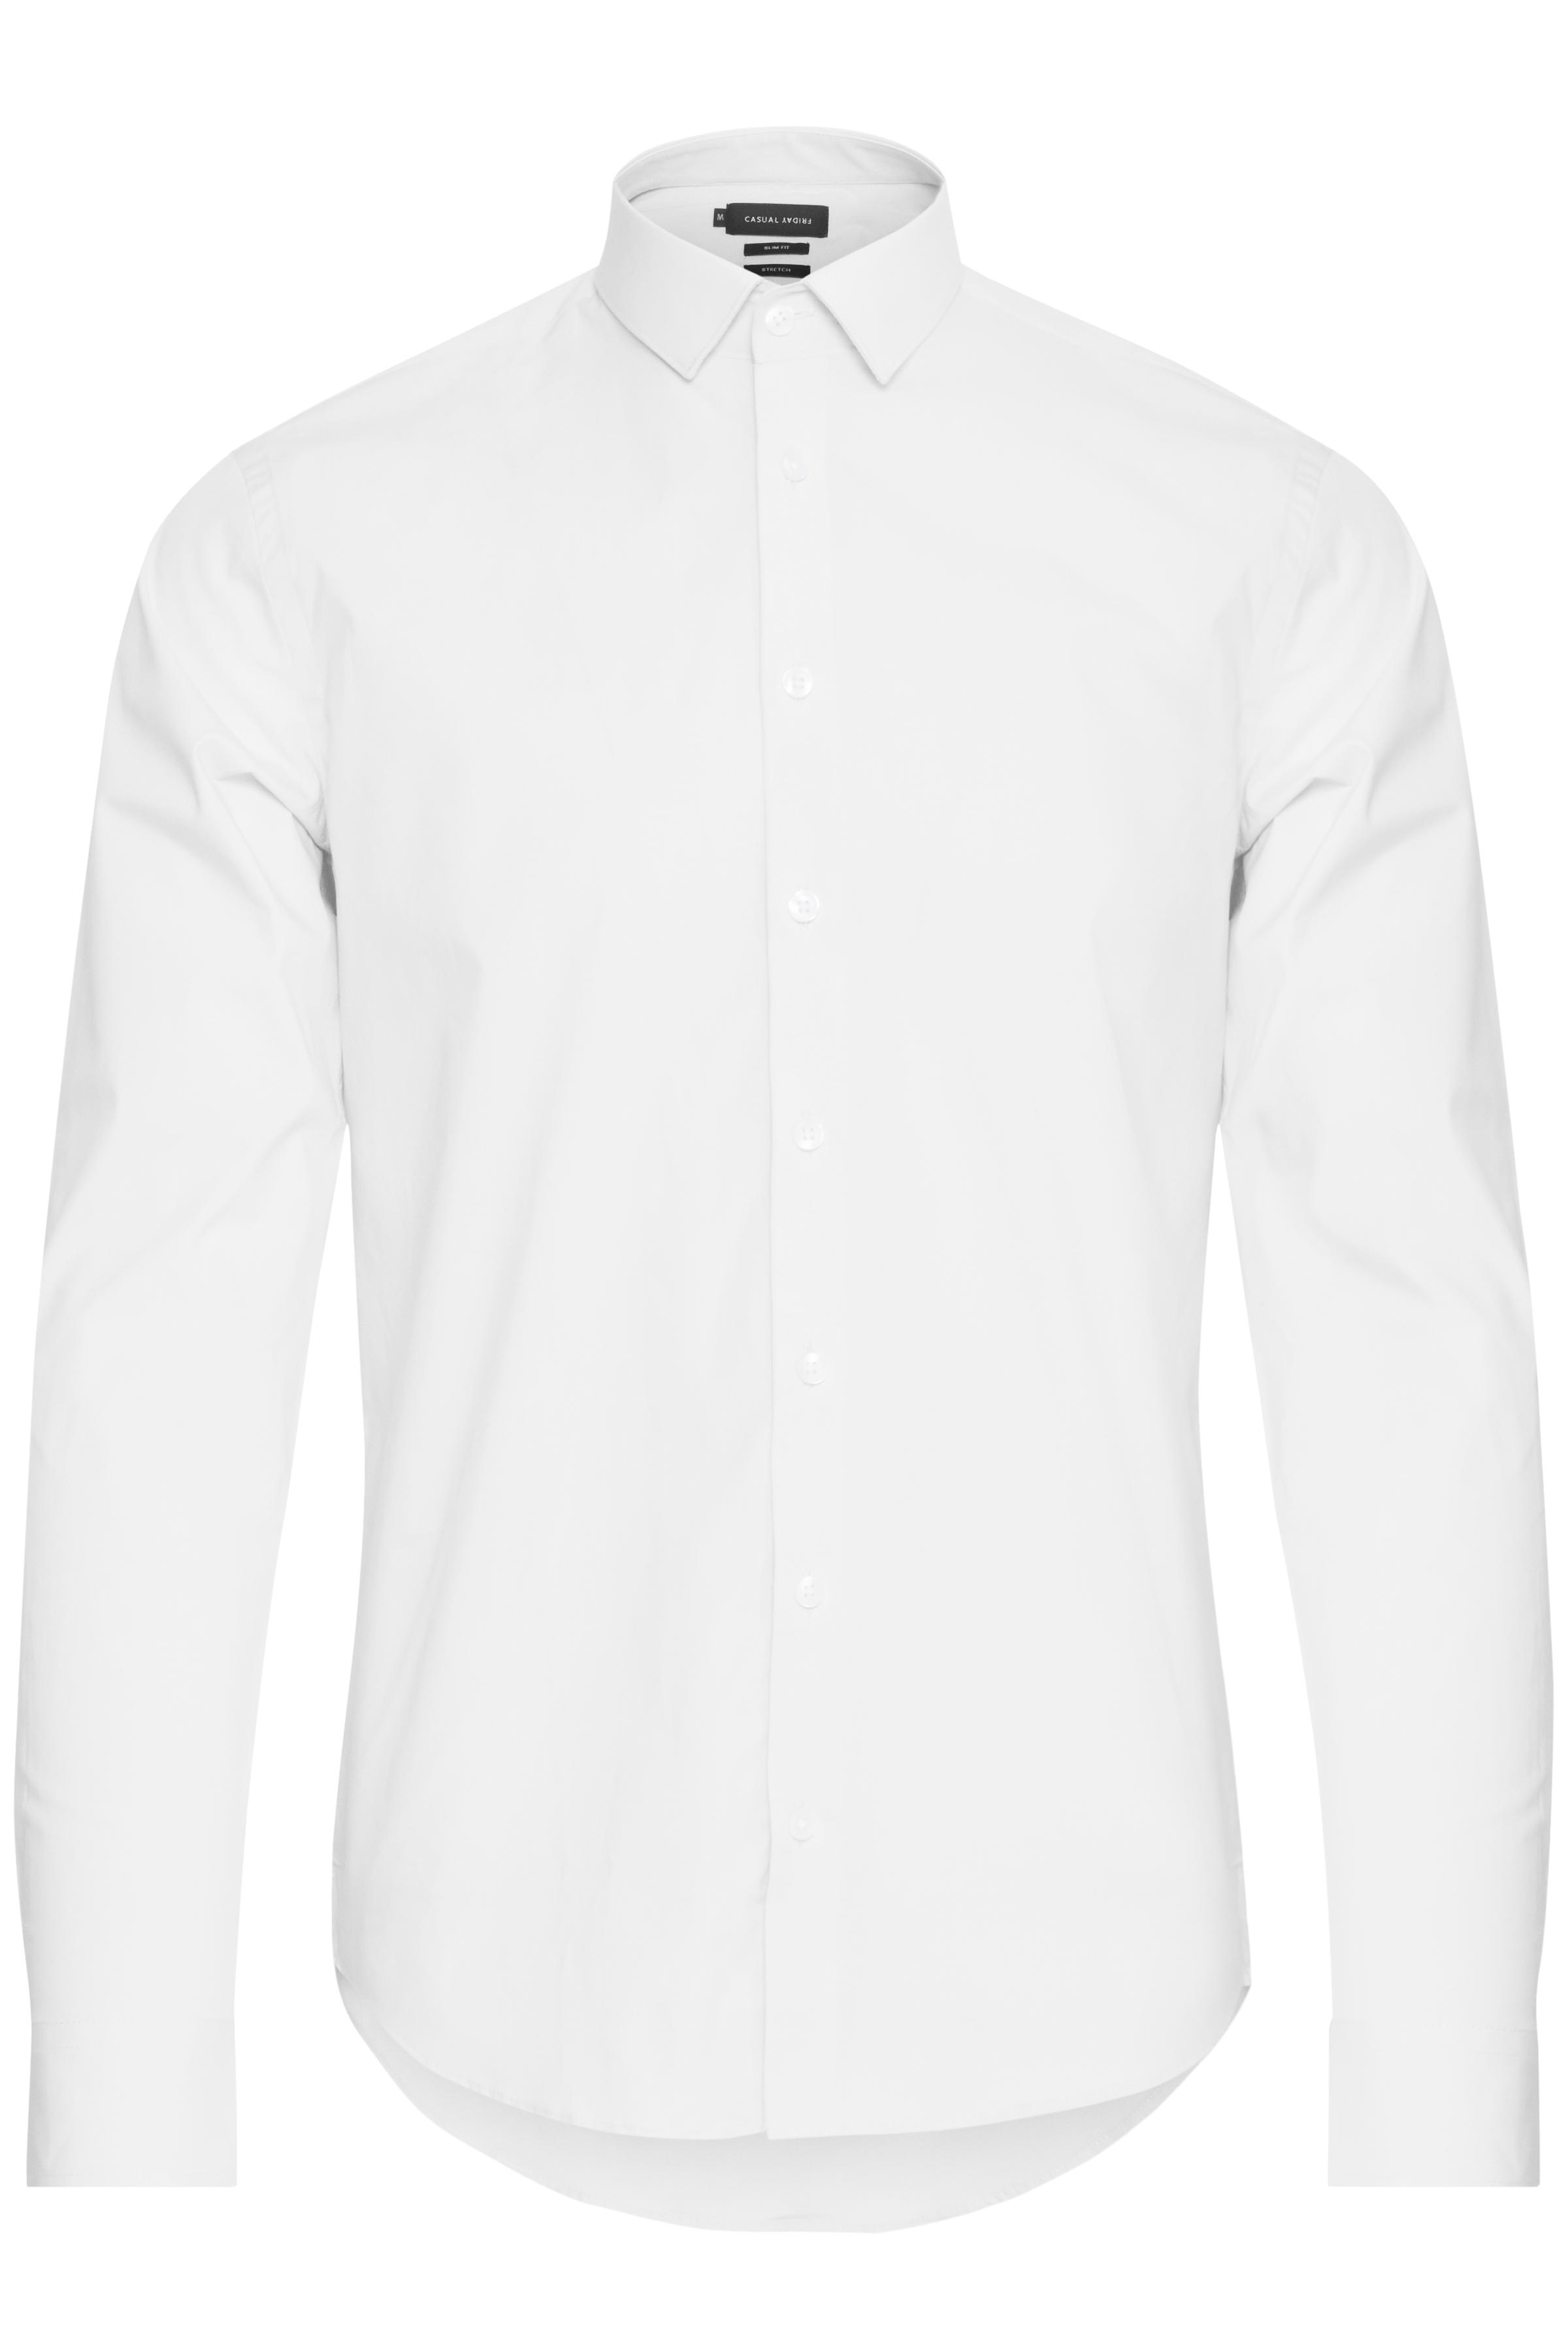 Image of Casual Friday Herre Flot skjorte - Hvid